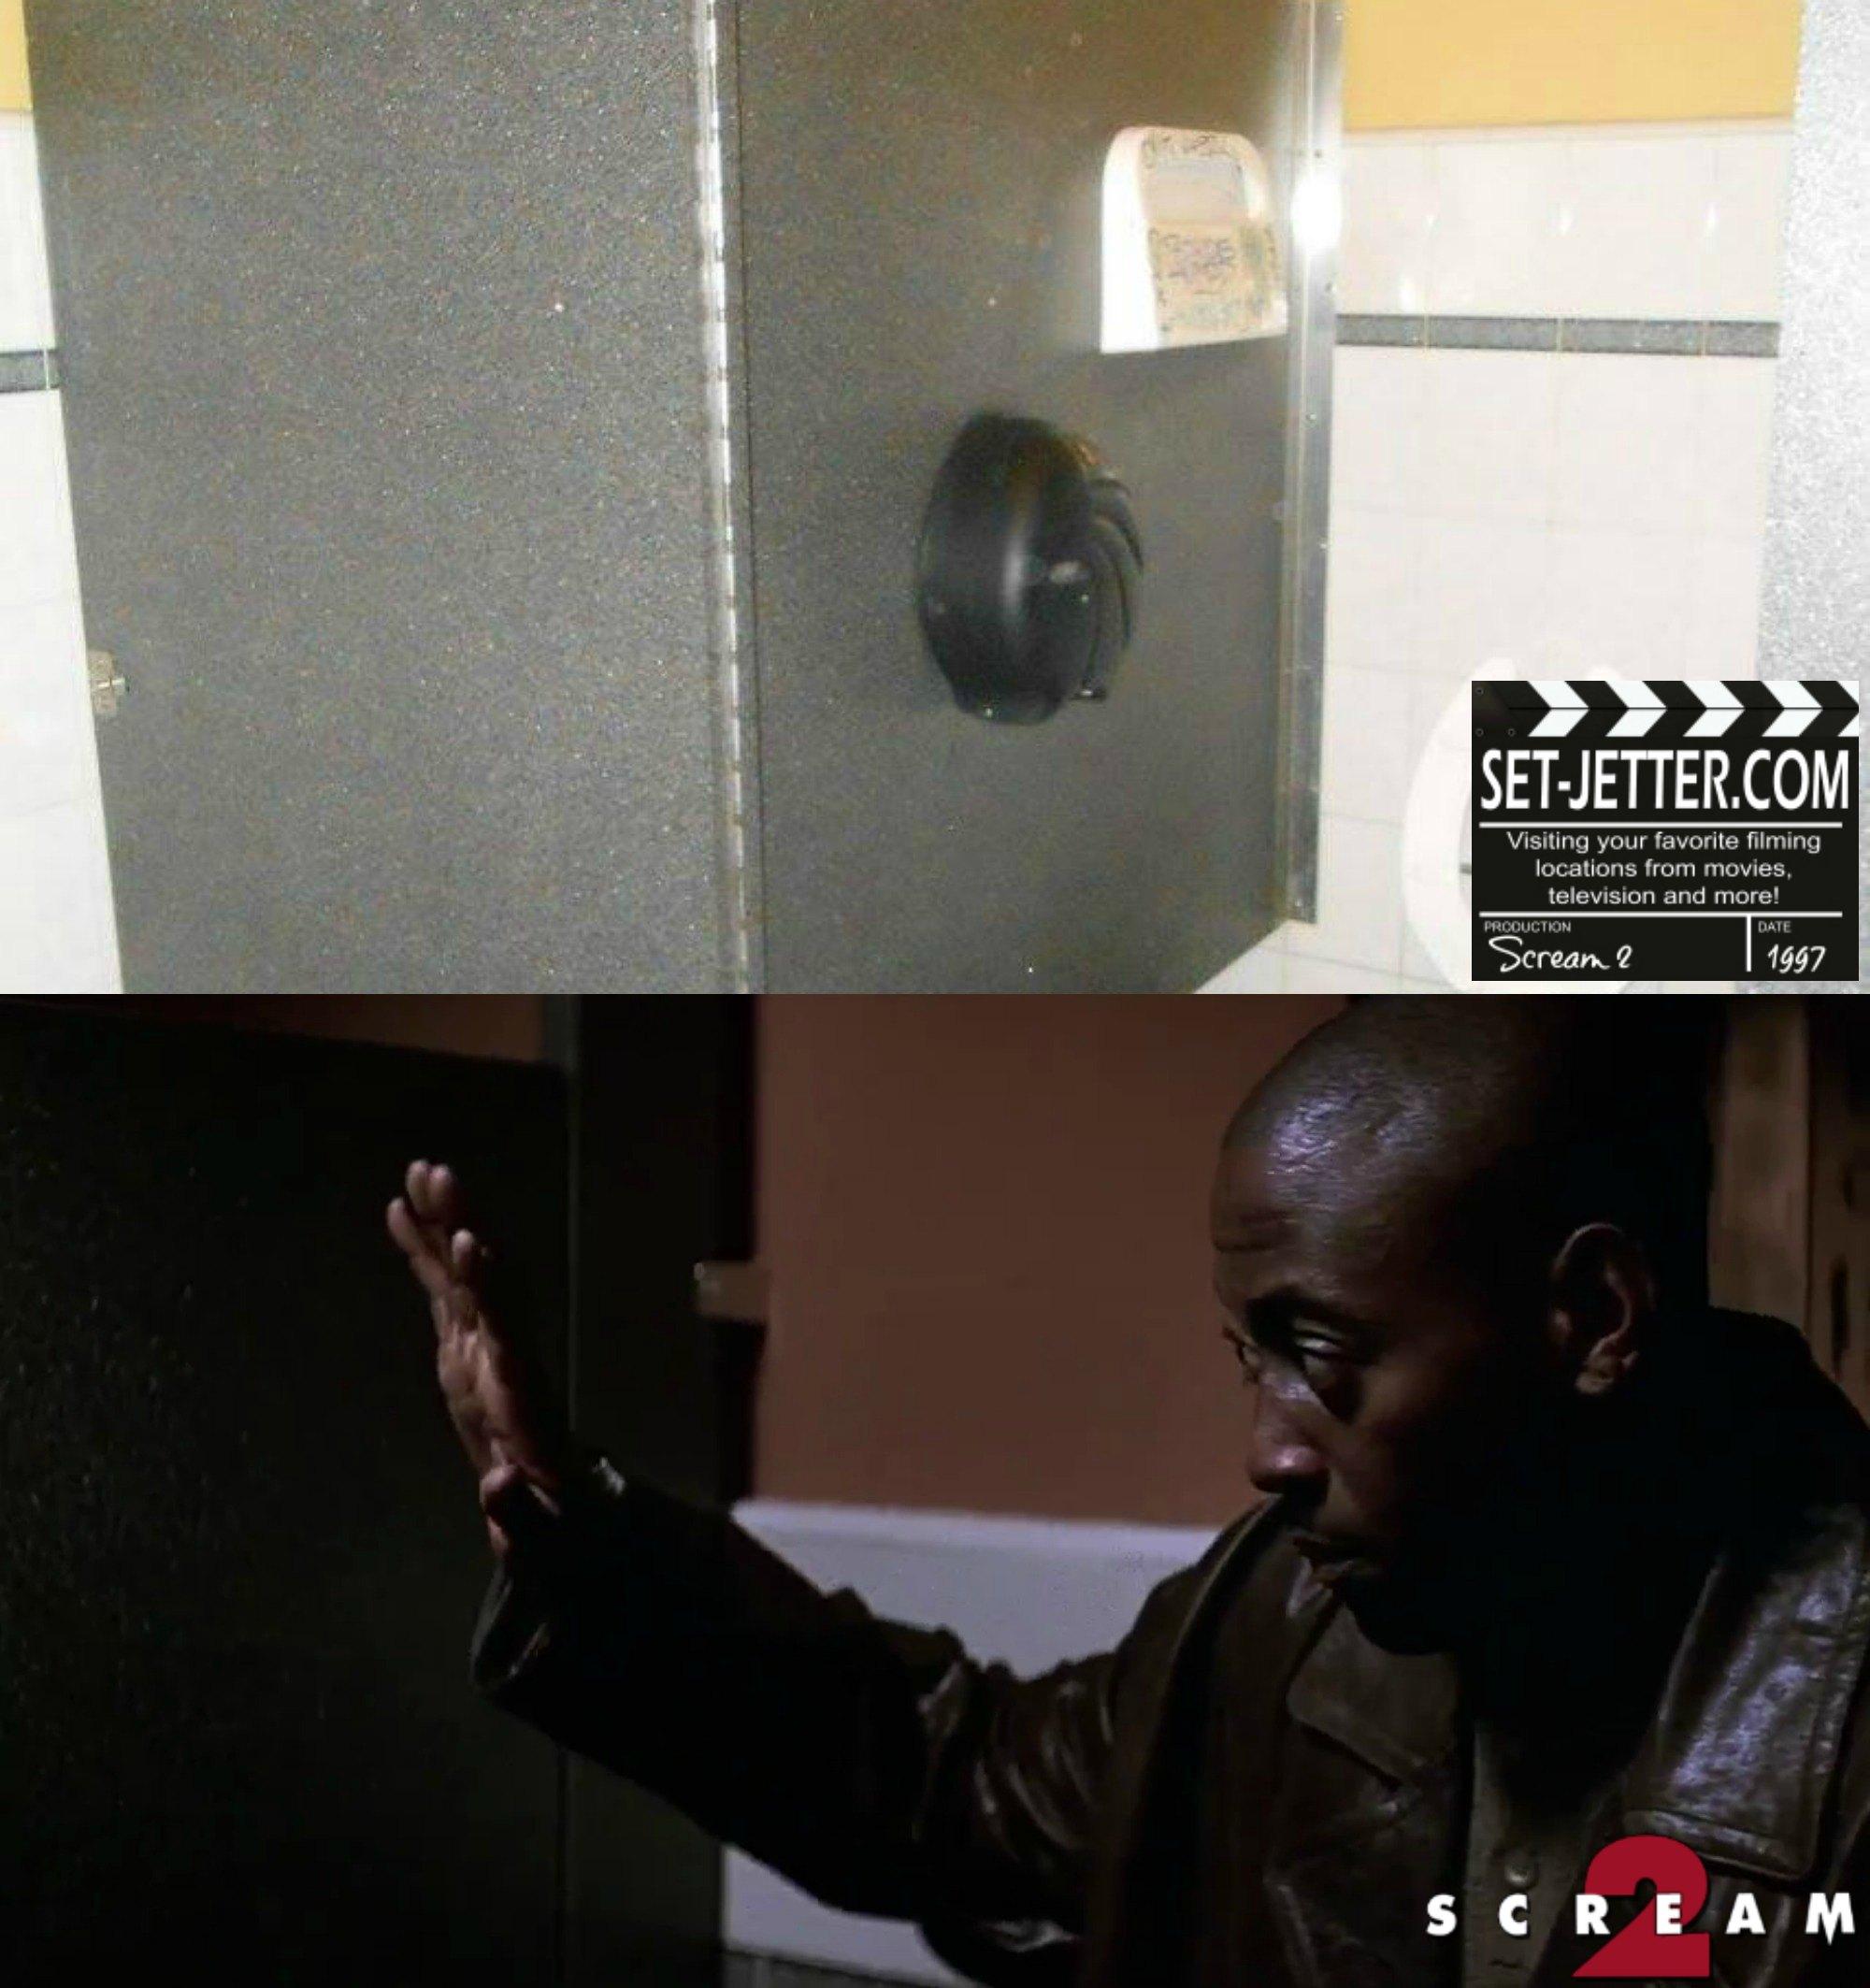 Scream 2 comparison 16.jpg